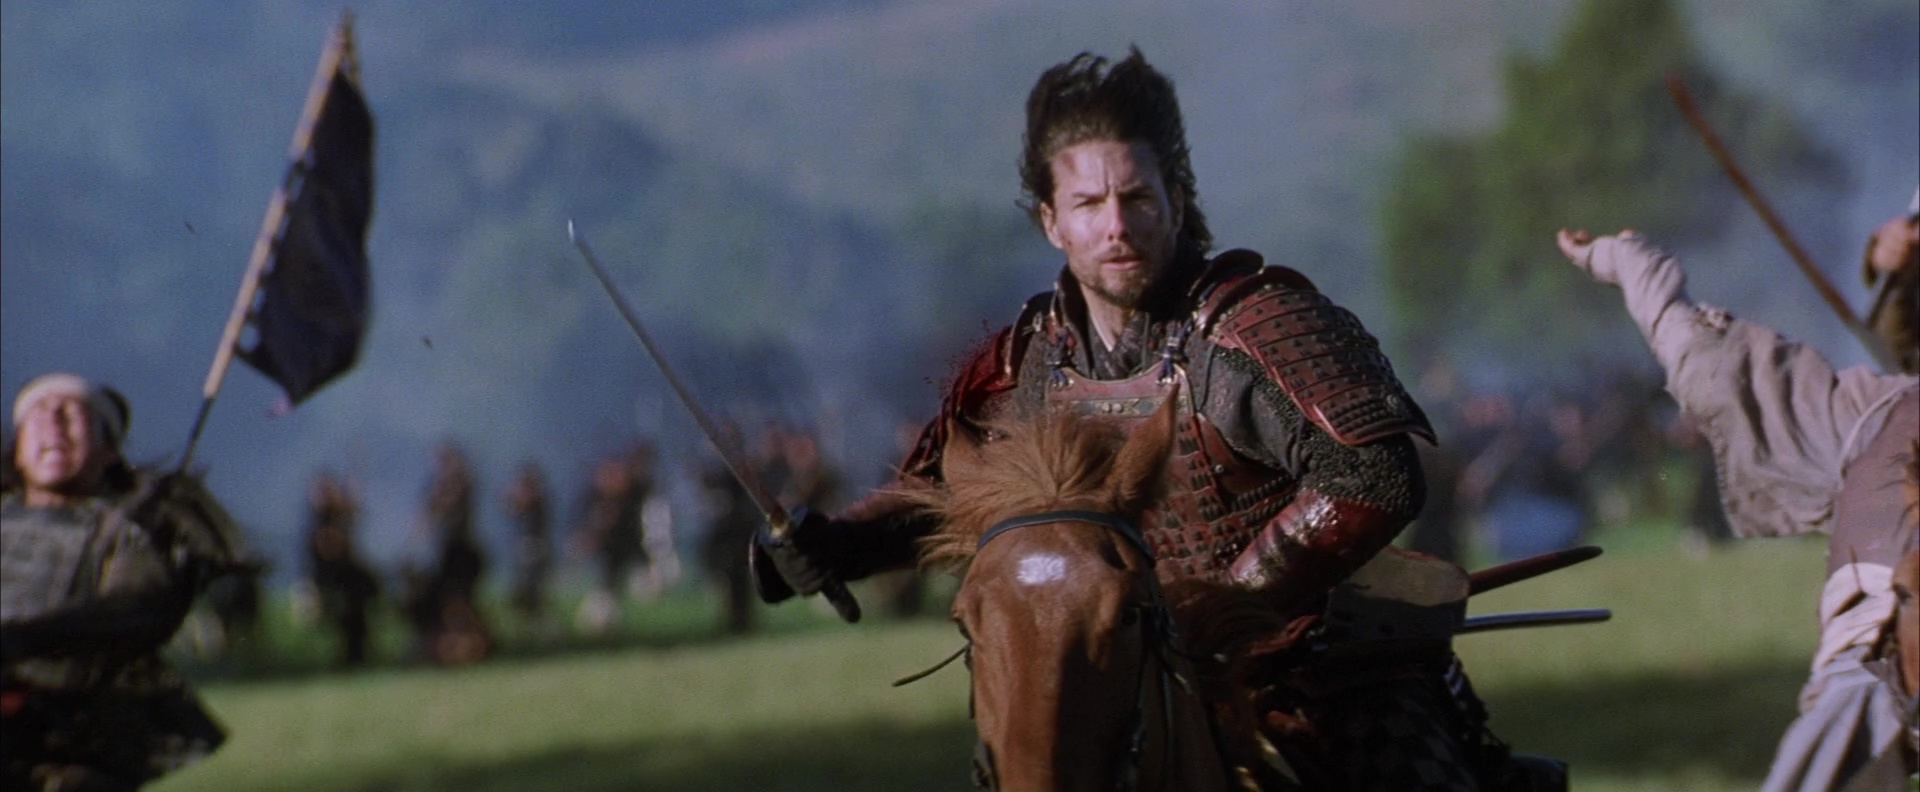 tom cruise dans Le Dernier samouraï (2003) d'Edward Zwick